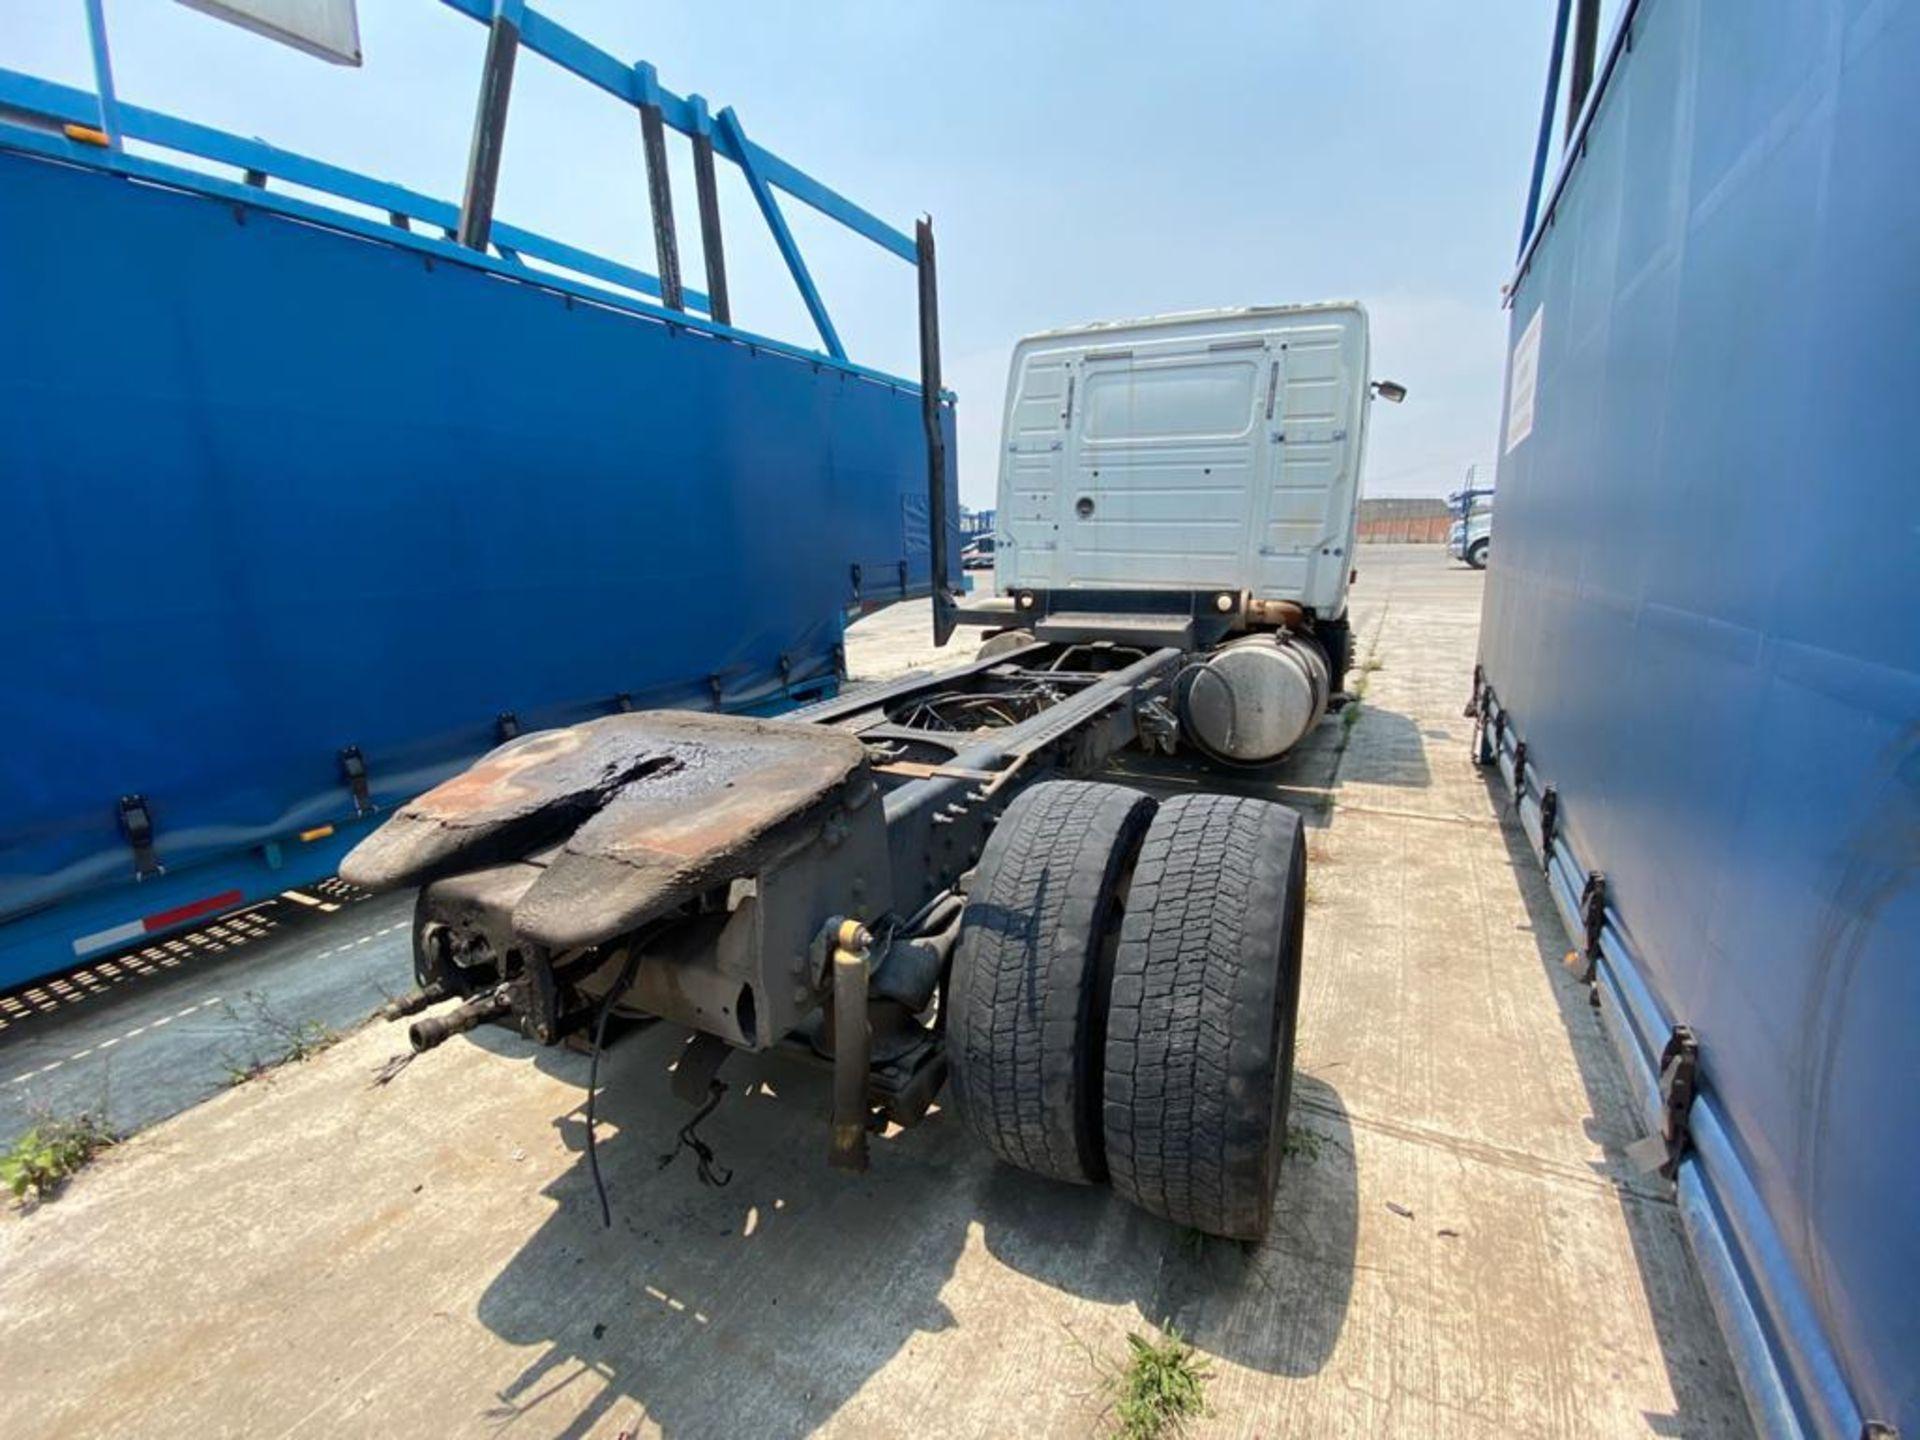 2001 Volvo Sleeper Truck Tractor, estándar transmissión of 18 speeds, with Volvo motor - Image 11 of 60